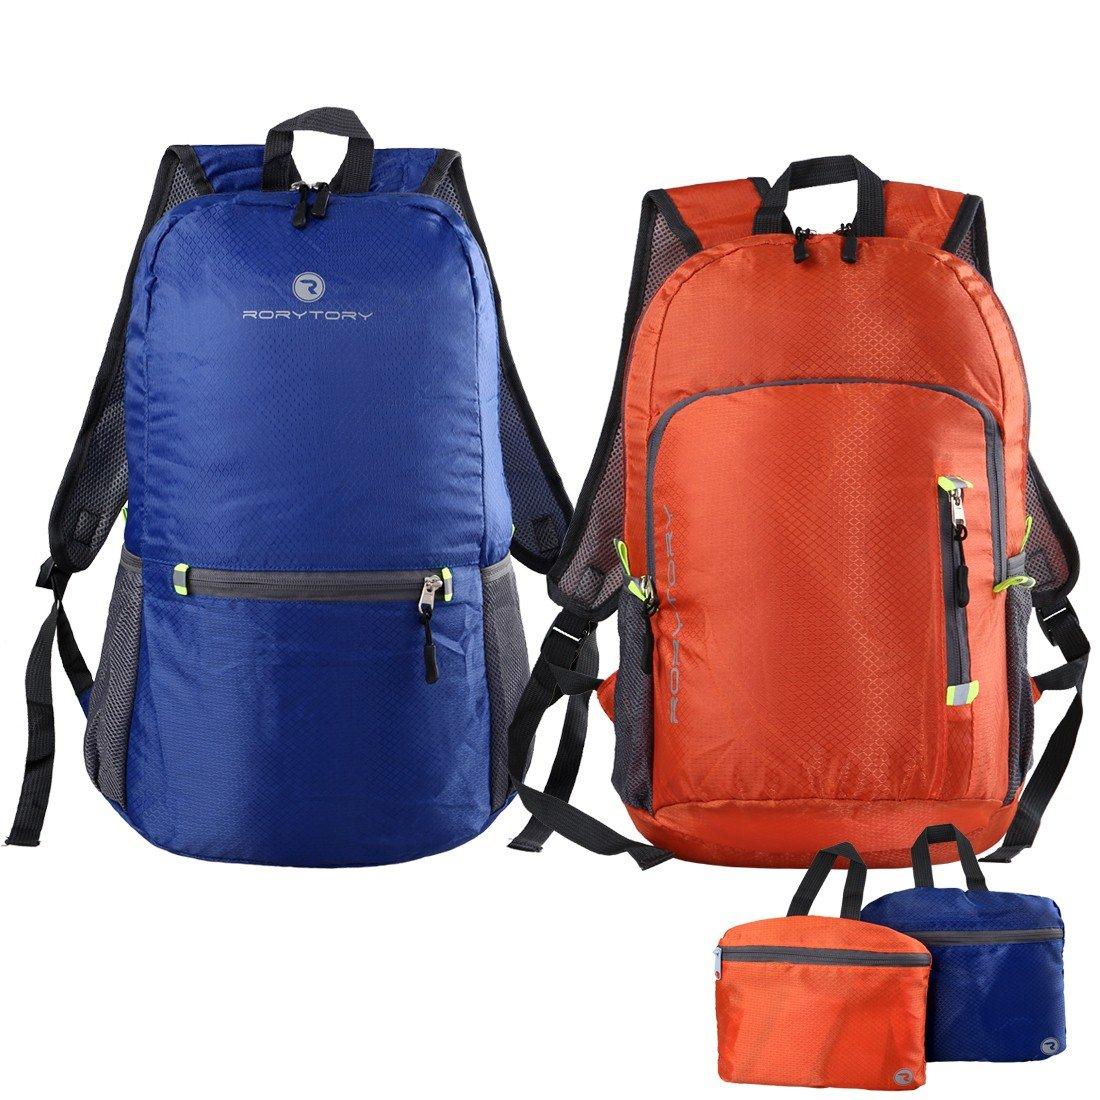 RoryTory 2pcソリッドカラー超軽量防水ハイキングバックパックコンボ B01KP97RY2 ブルー&オレンジ